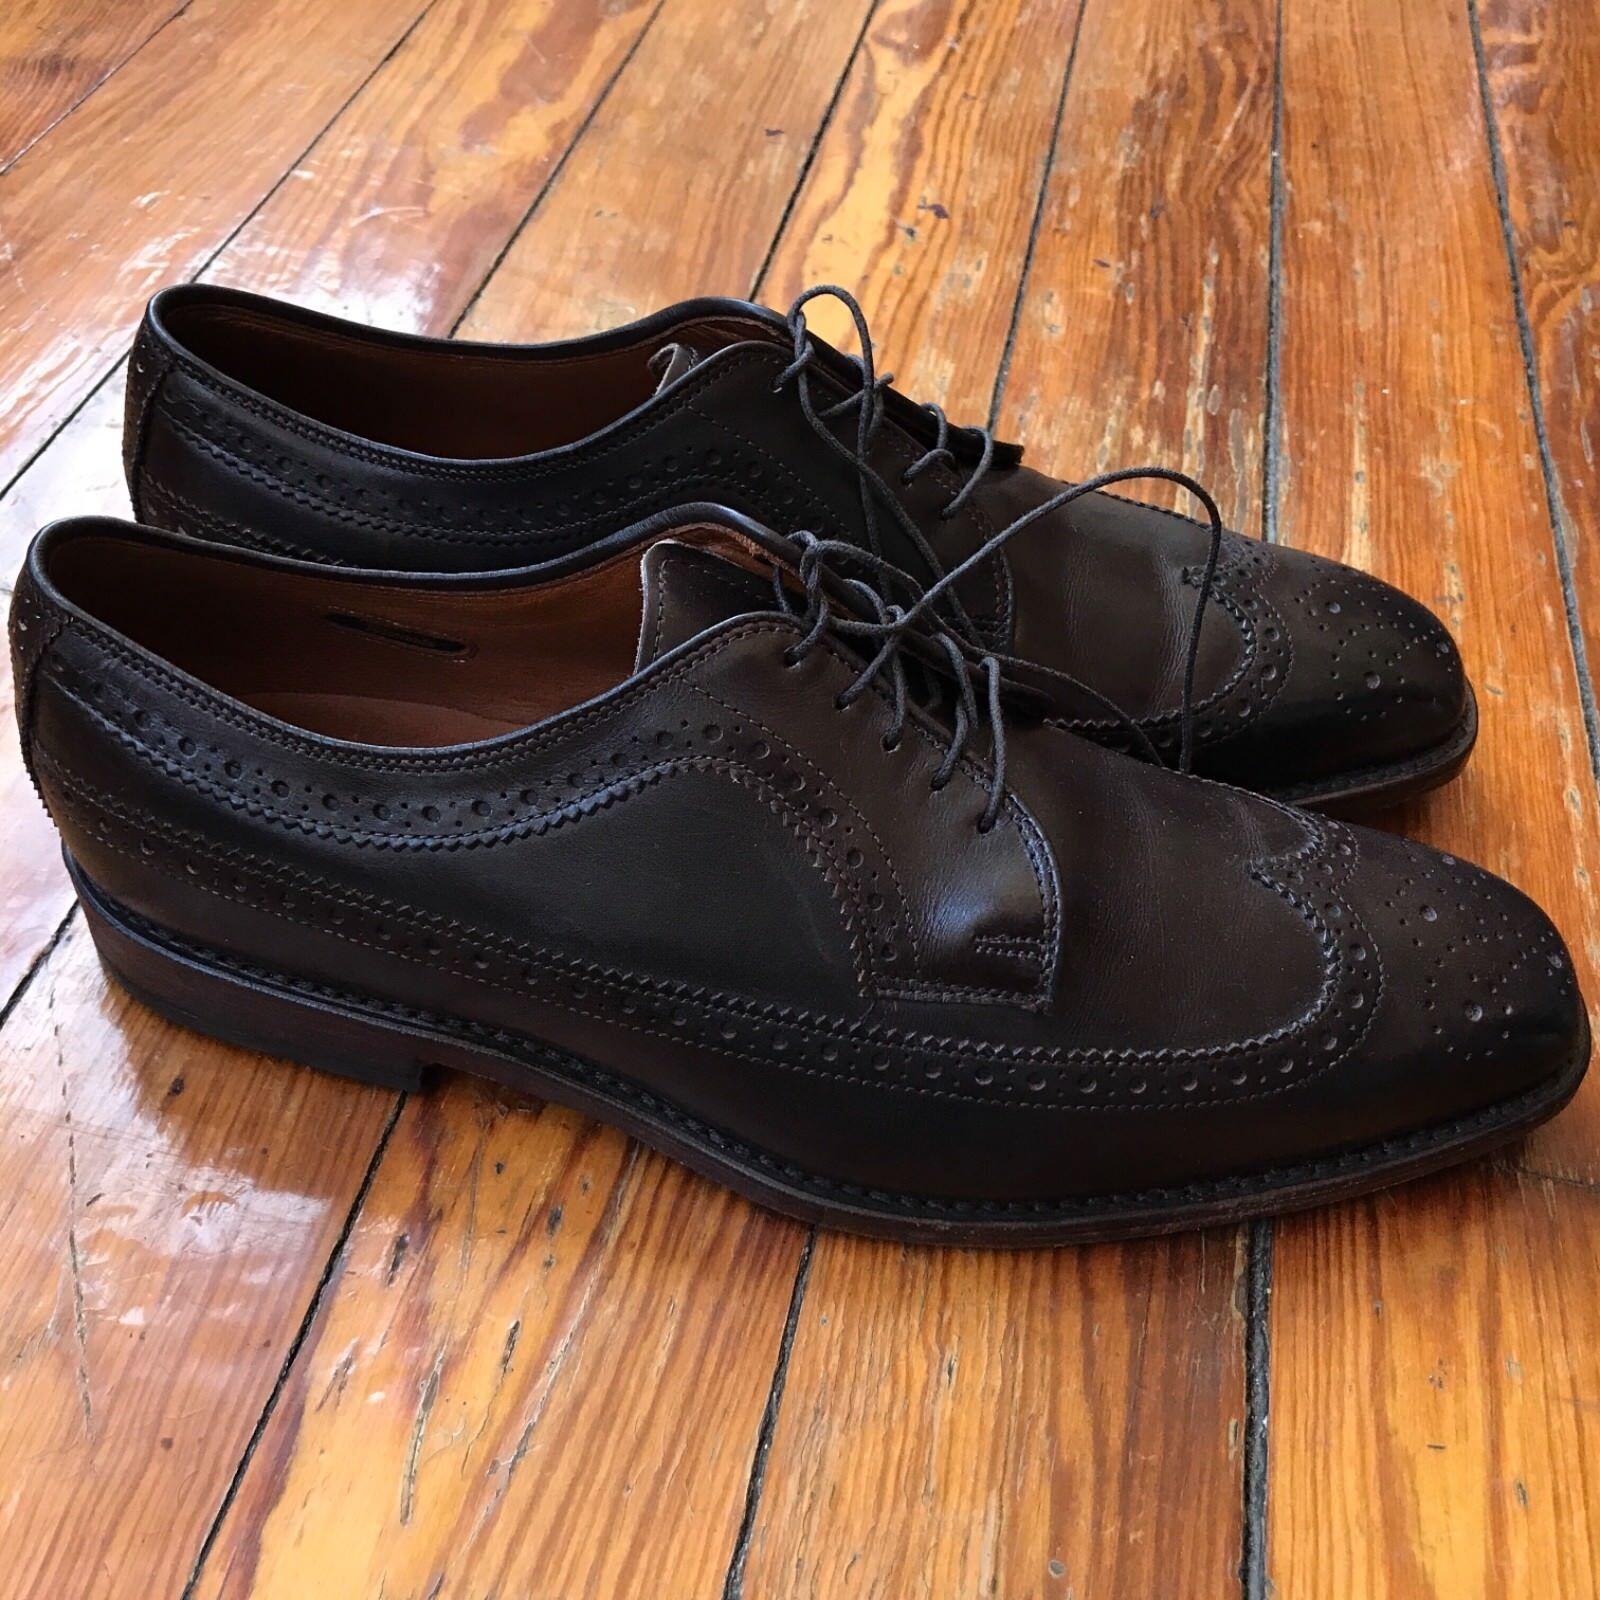 Allen Edmonds 'Larchmont' Brown Wingtip shoes Men's 9.5 D Made in USA Exc Cond